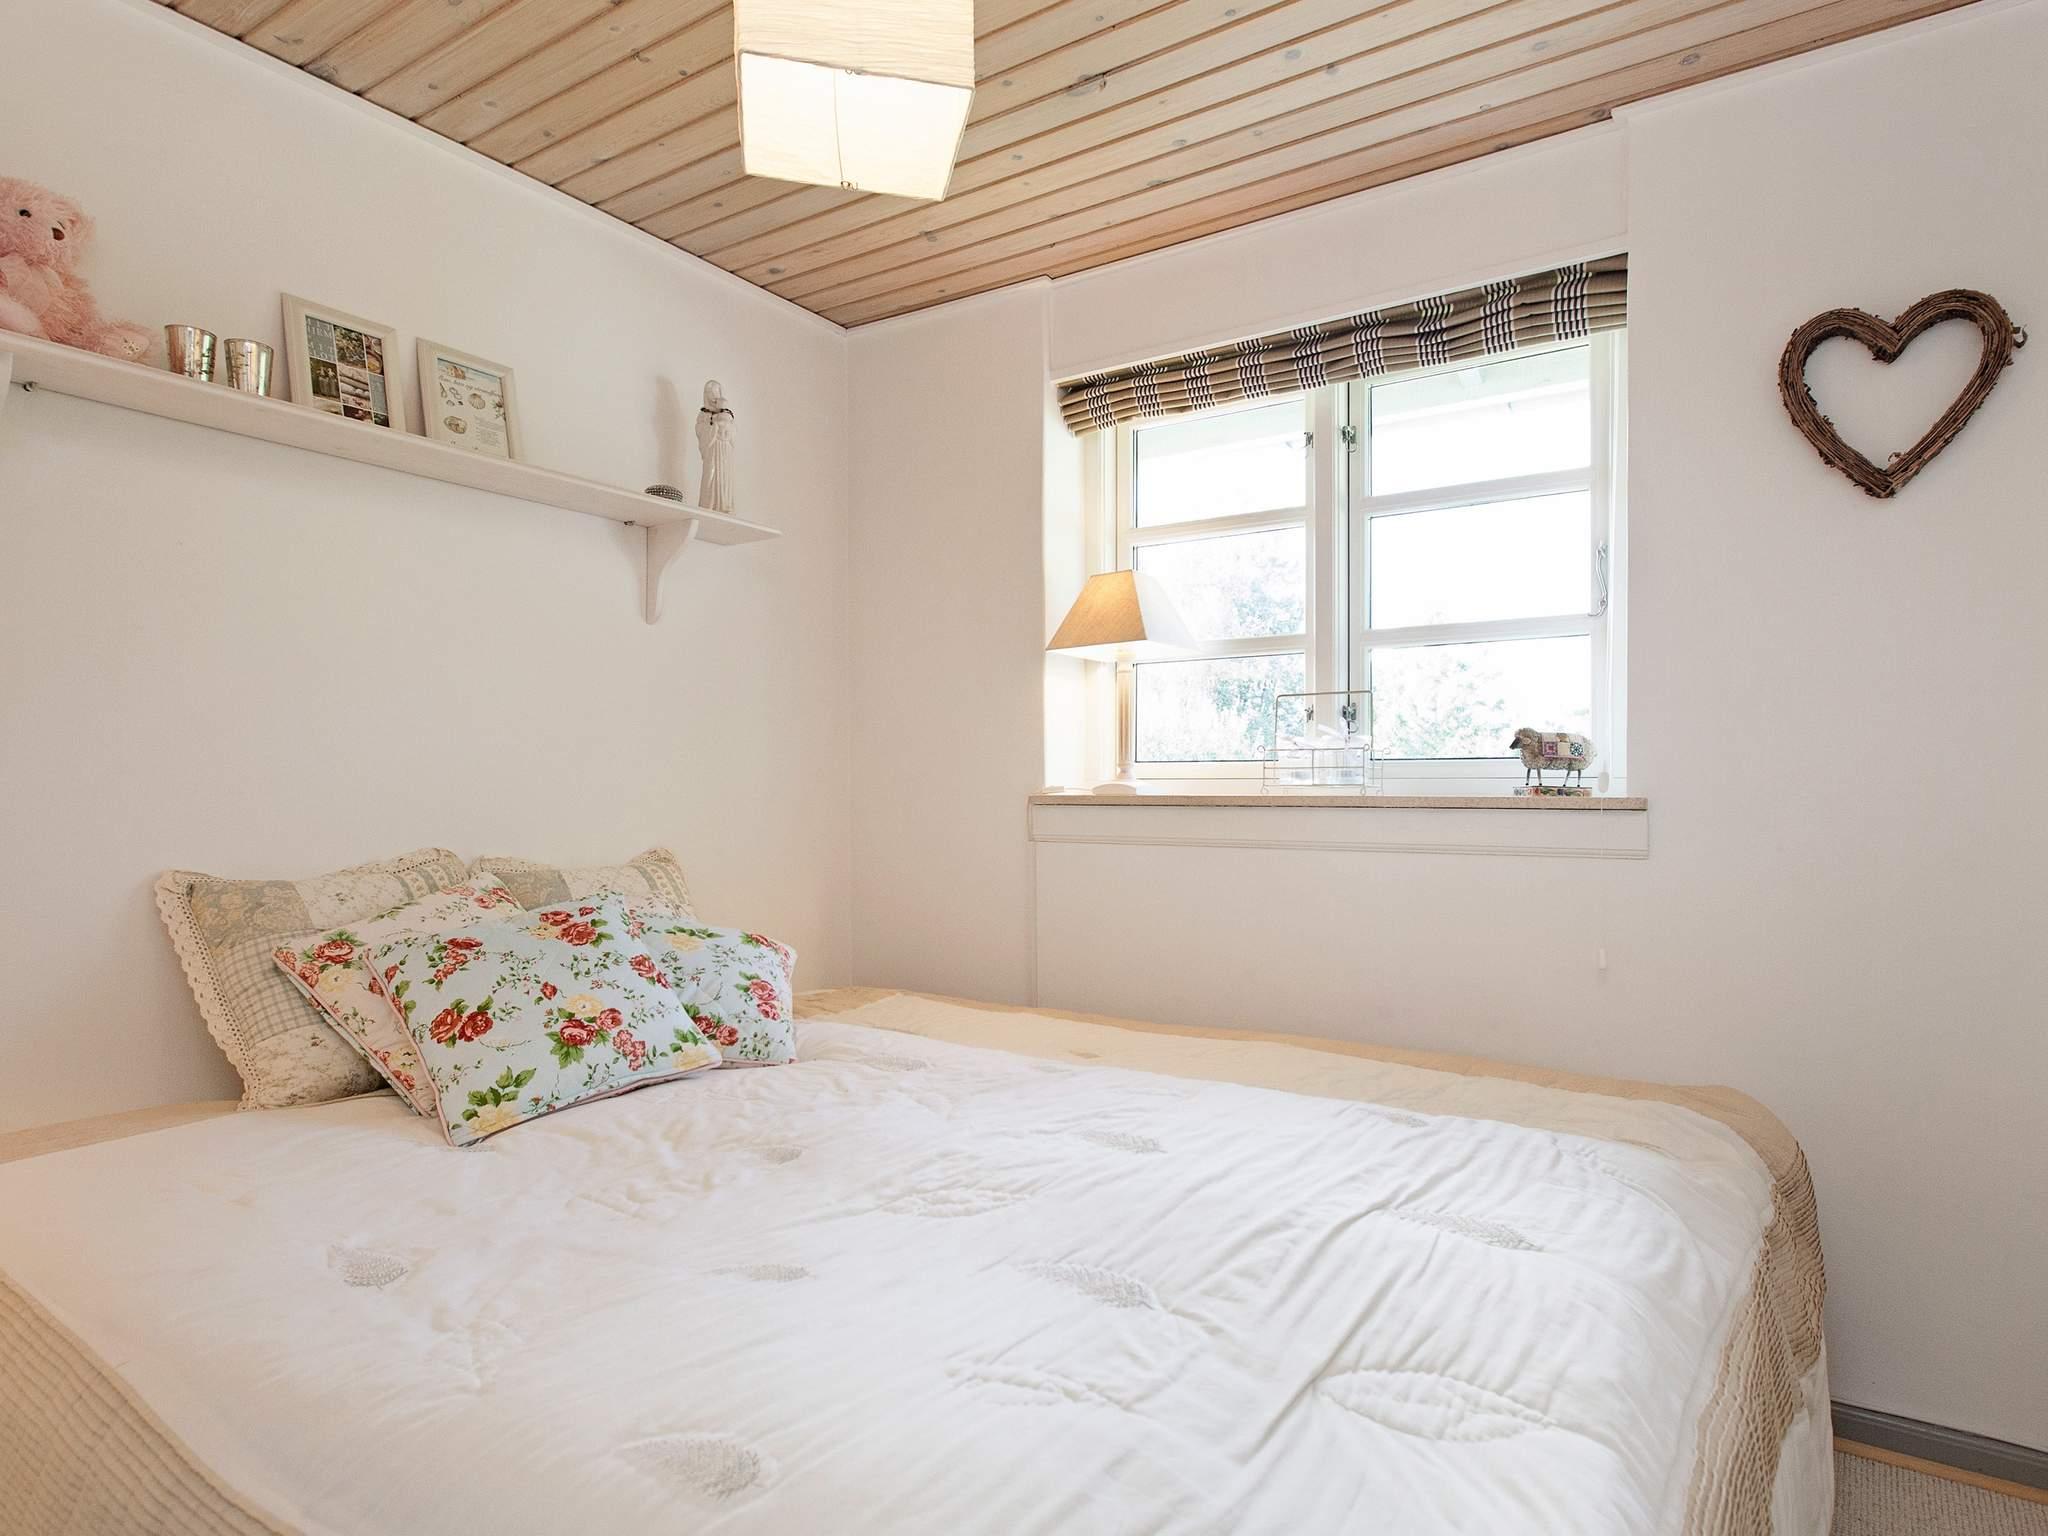 Ferienhaus Vejby Strand (319895), Vejby, , Nordseeland, Dänemark, Bild 10